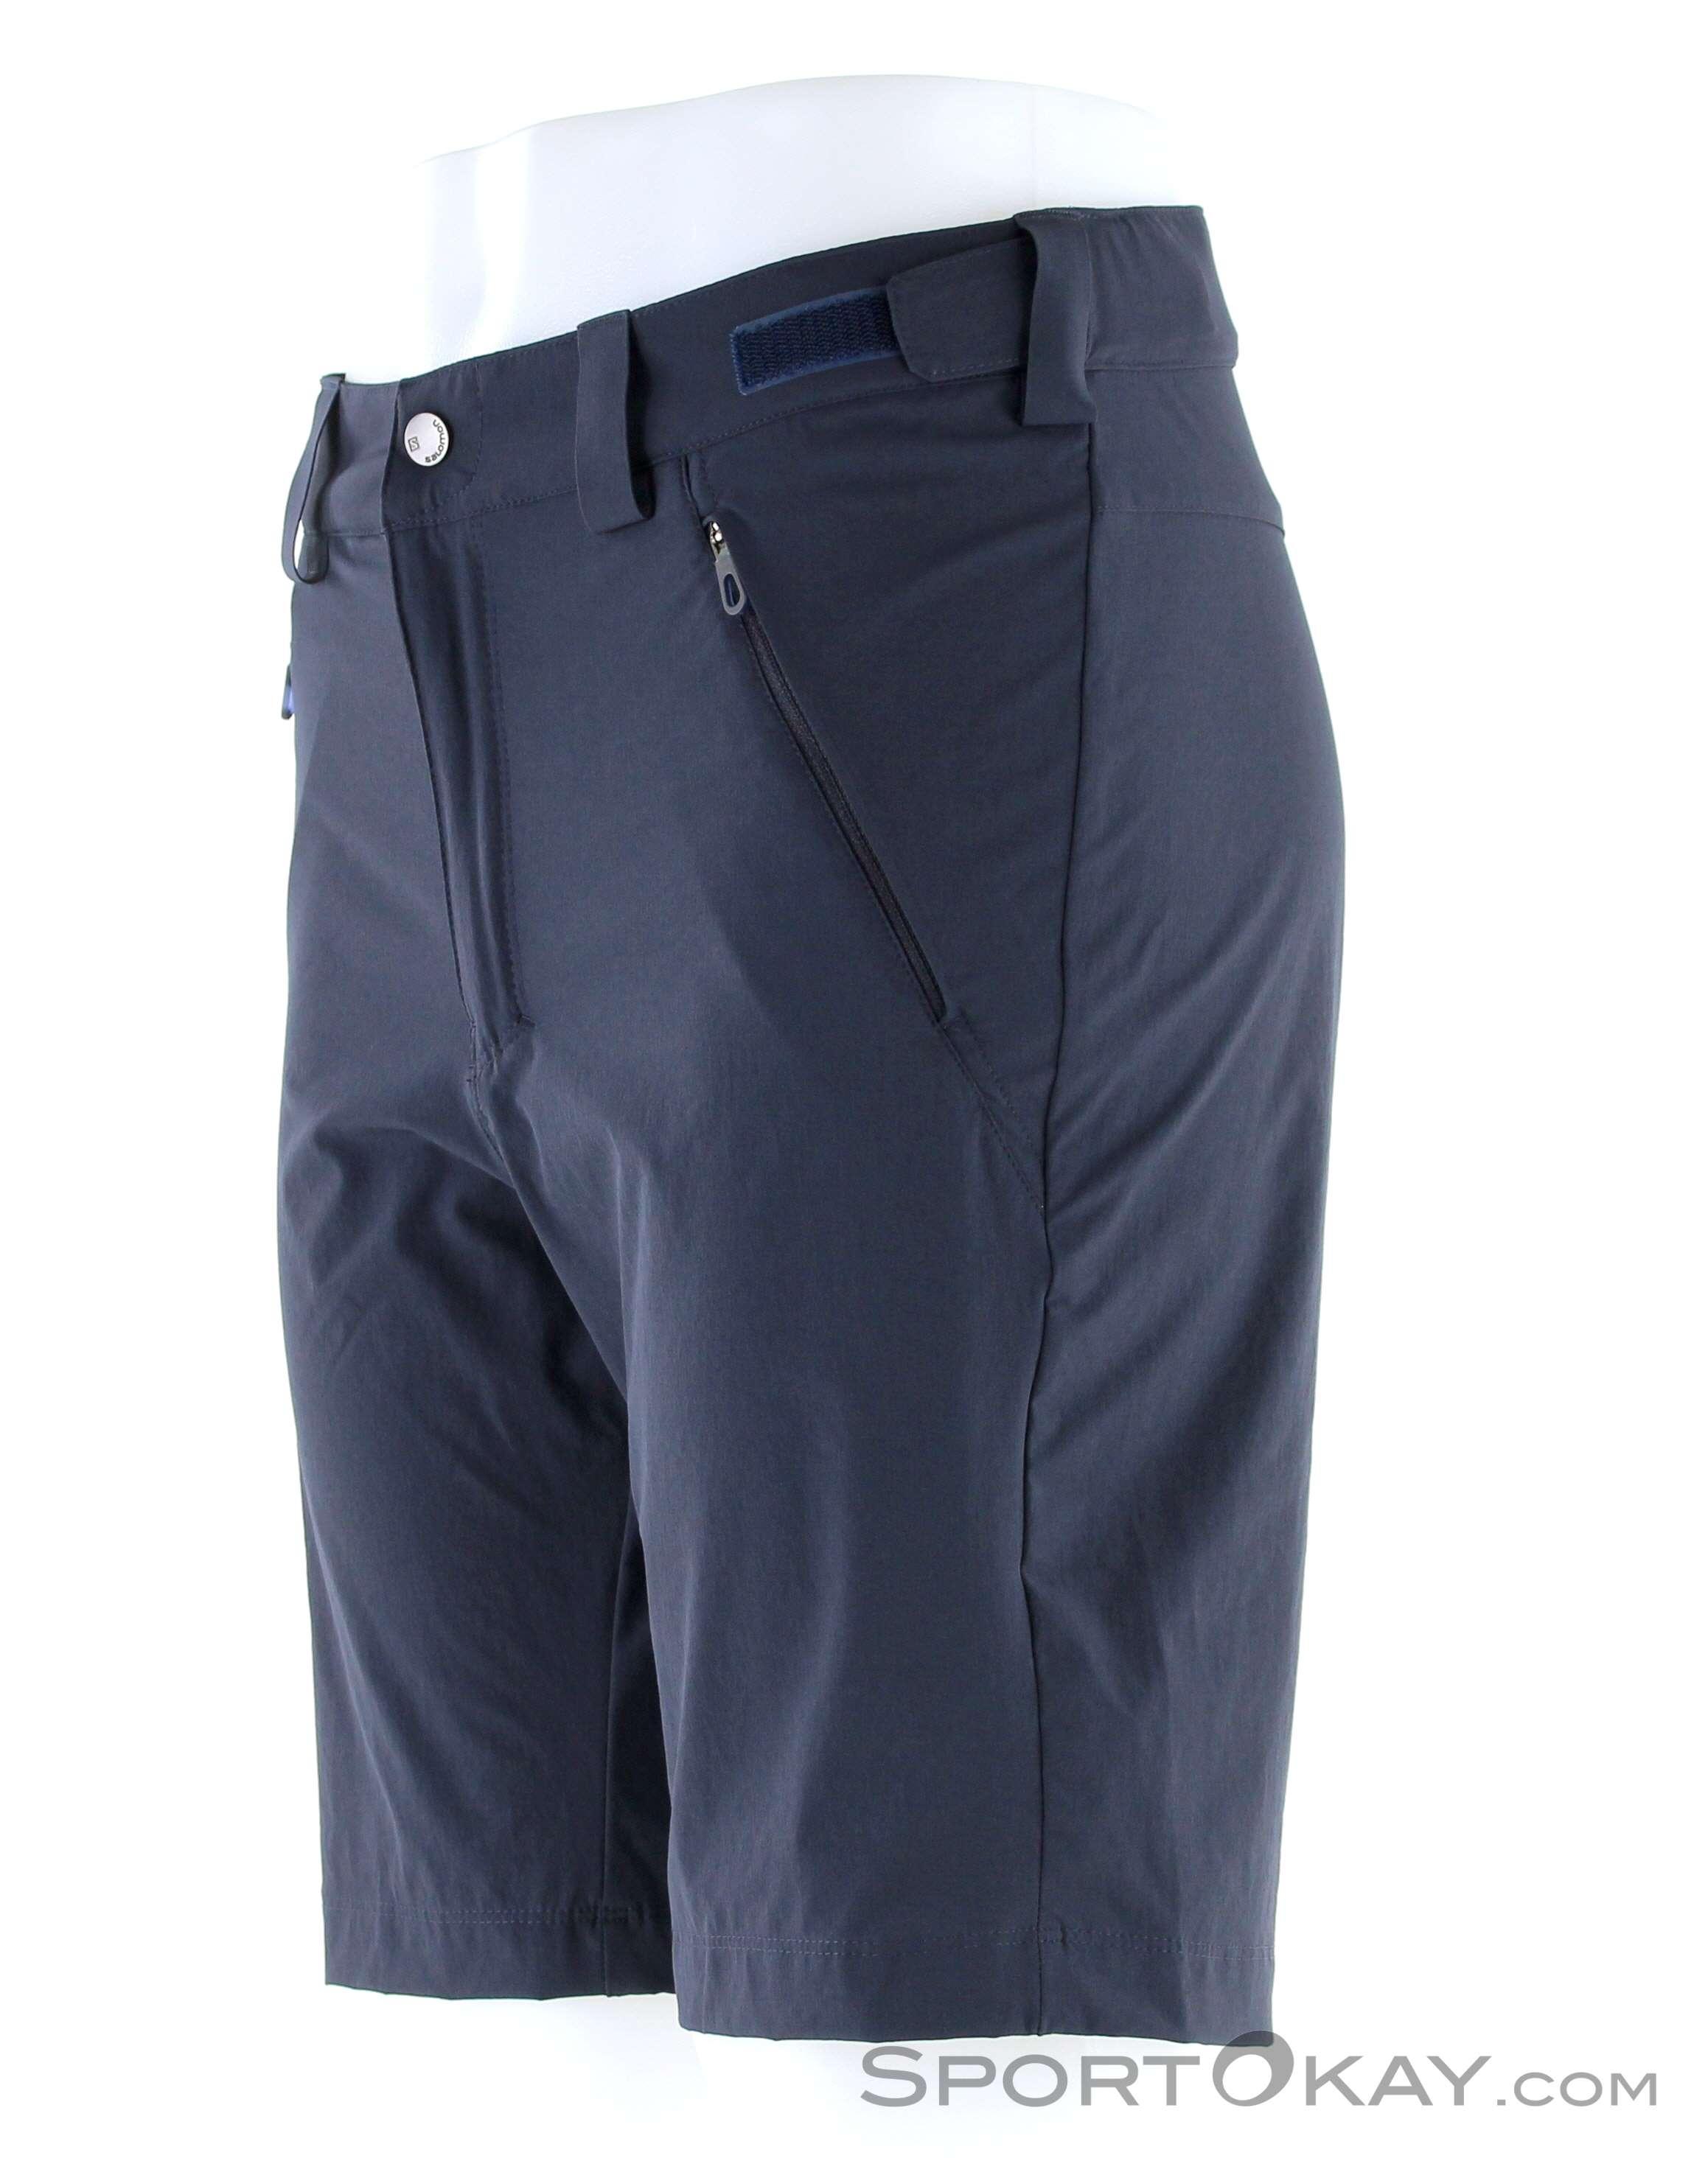 Salomon Salomon Wayfarer Short Mens Outdoor Shorts